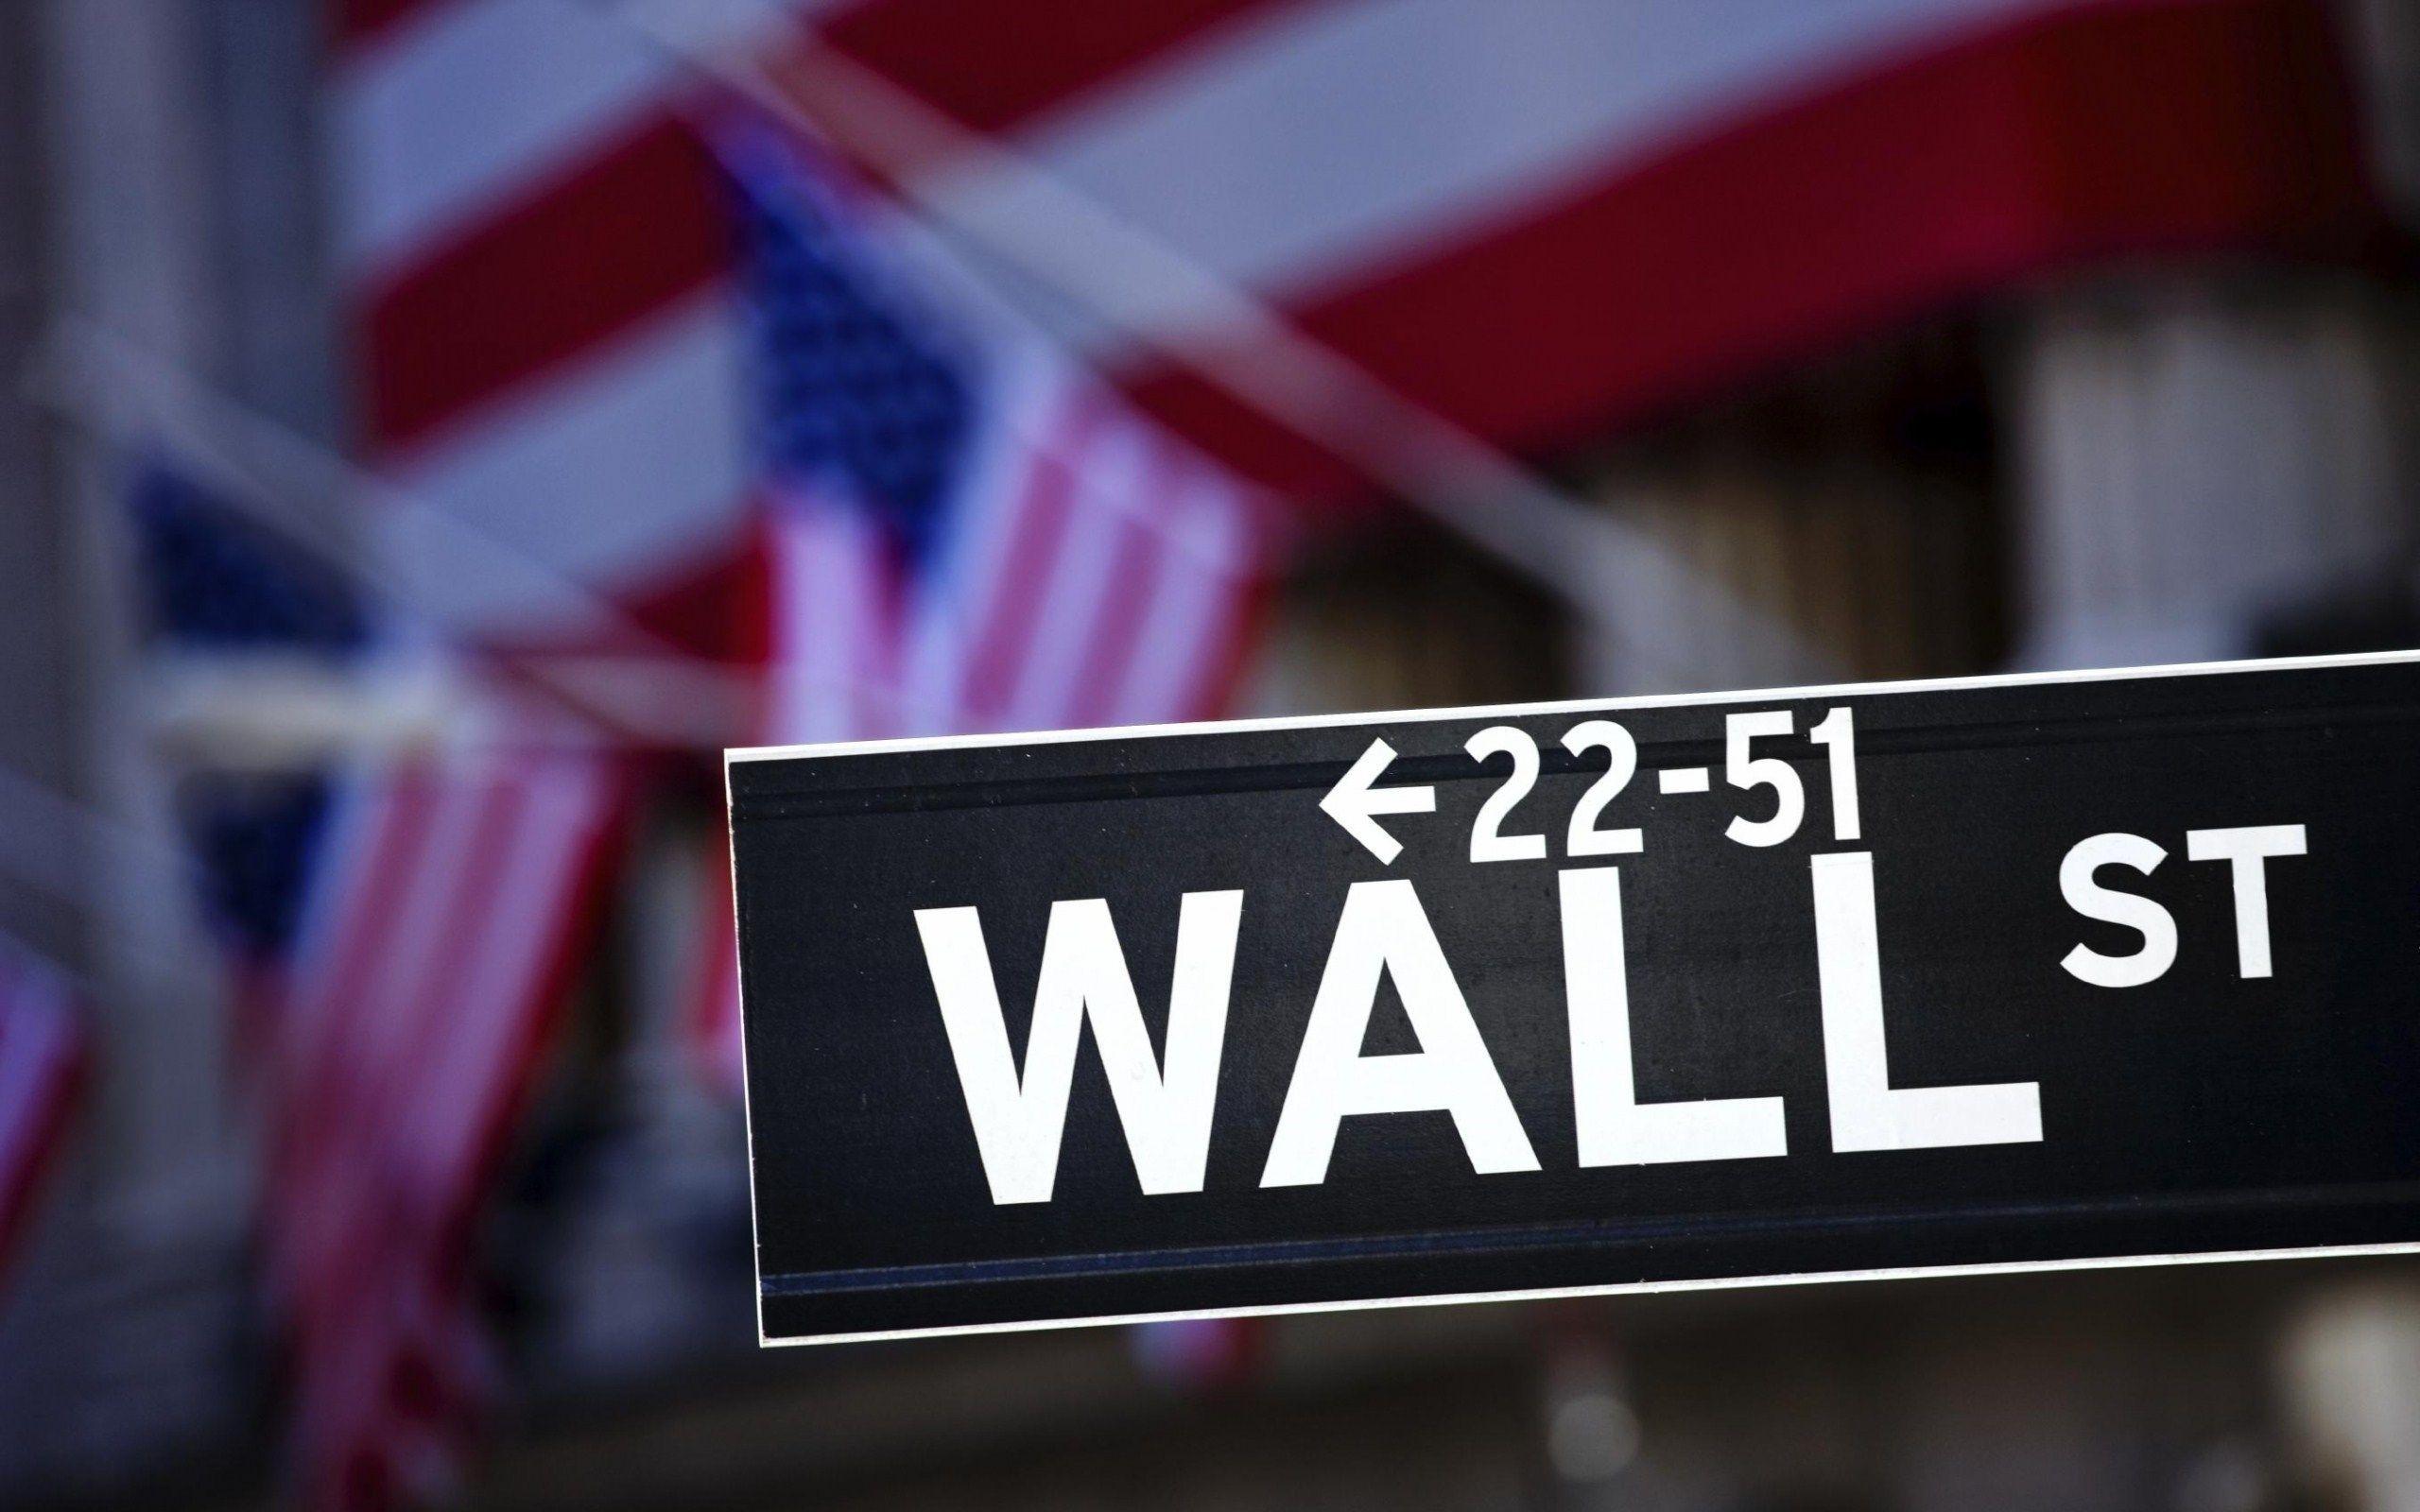 Wall Street Wallpaper